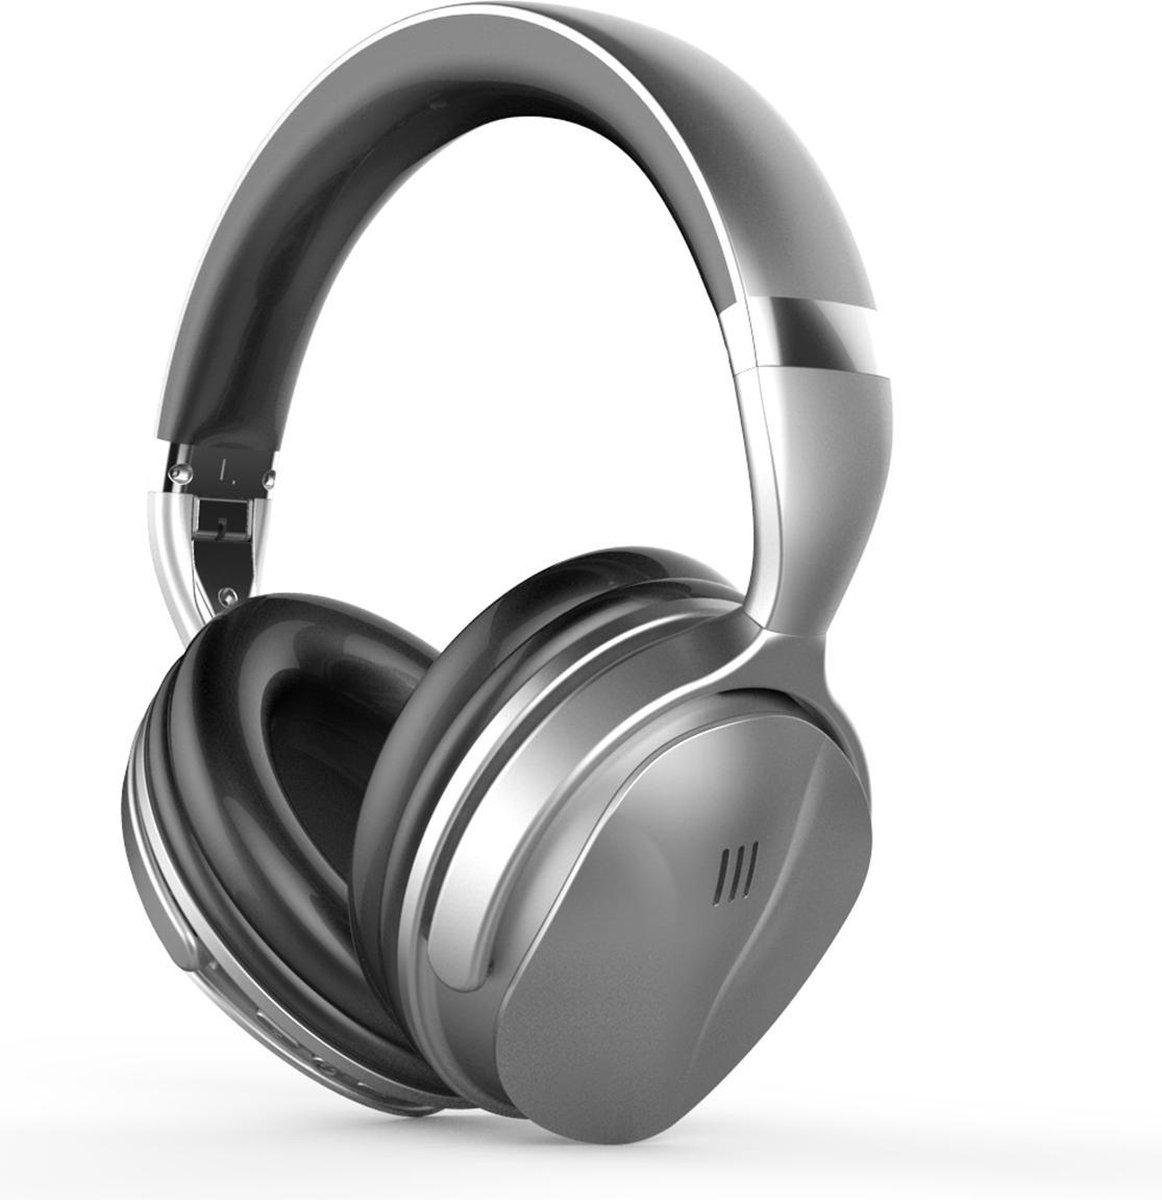 YONO Noise Cancelling Hoofdtelefoon ANC80 – Over-Ear Koptelefoon Bluetooth – Draadloos – Zilver